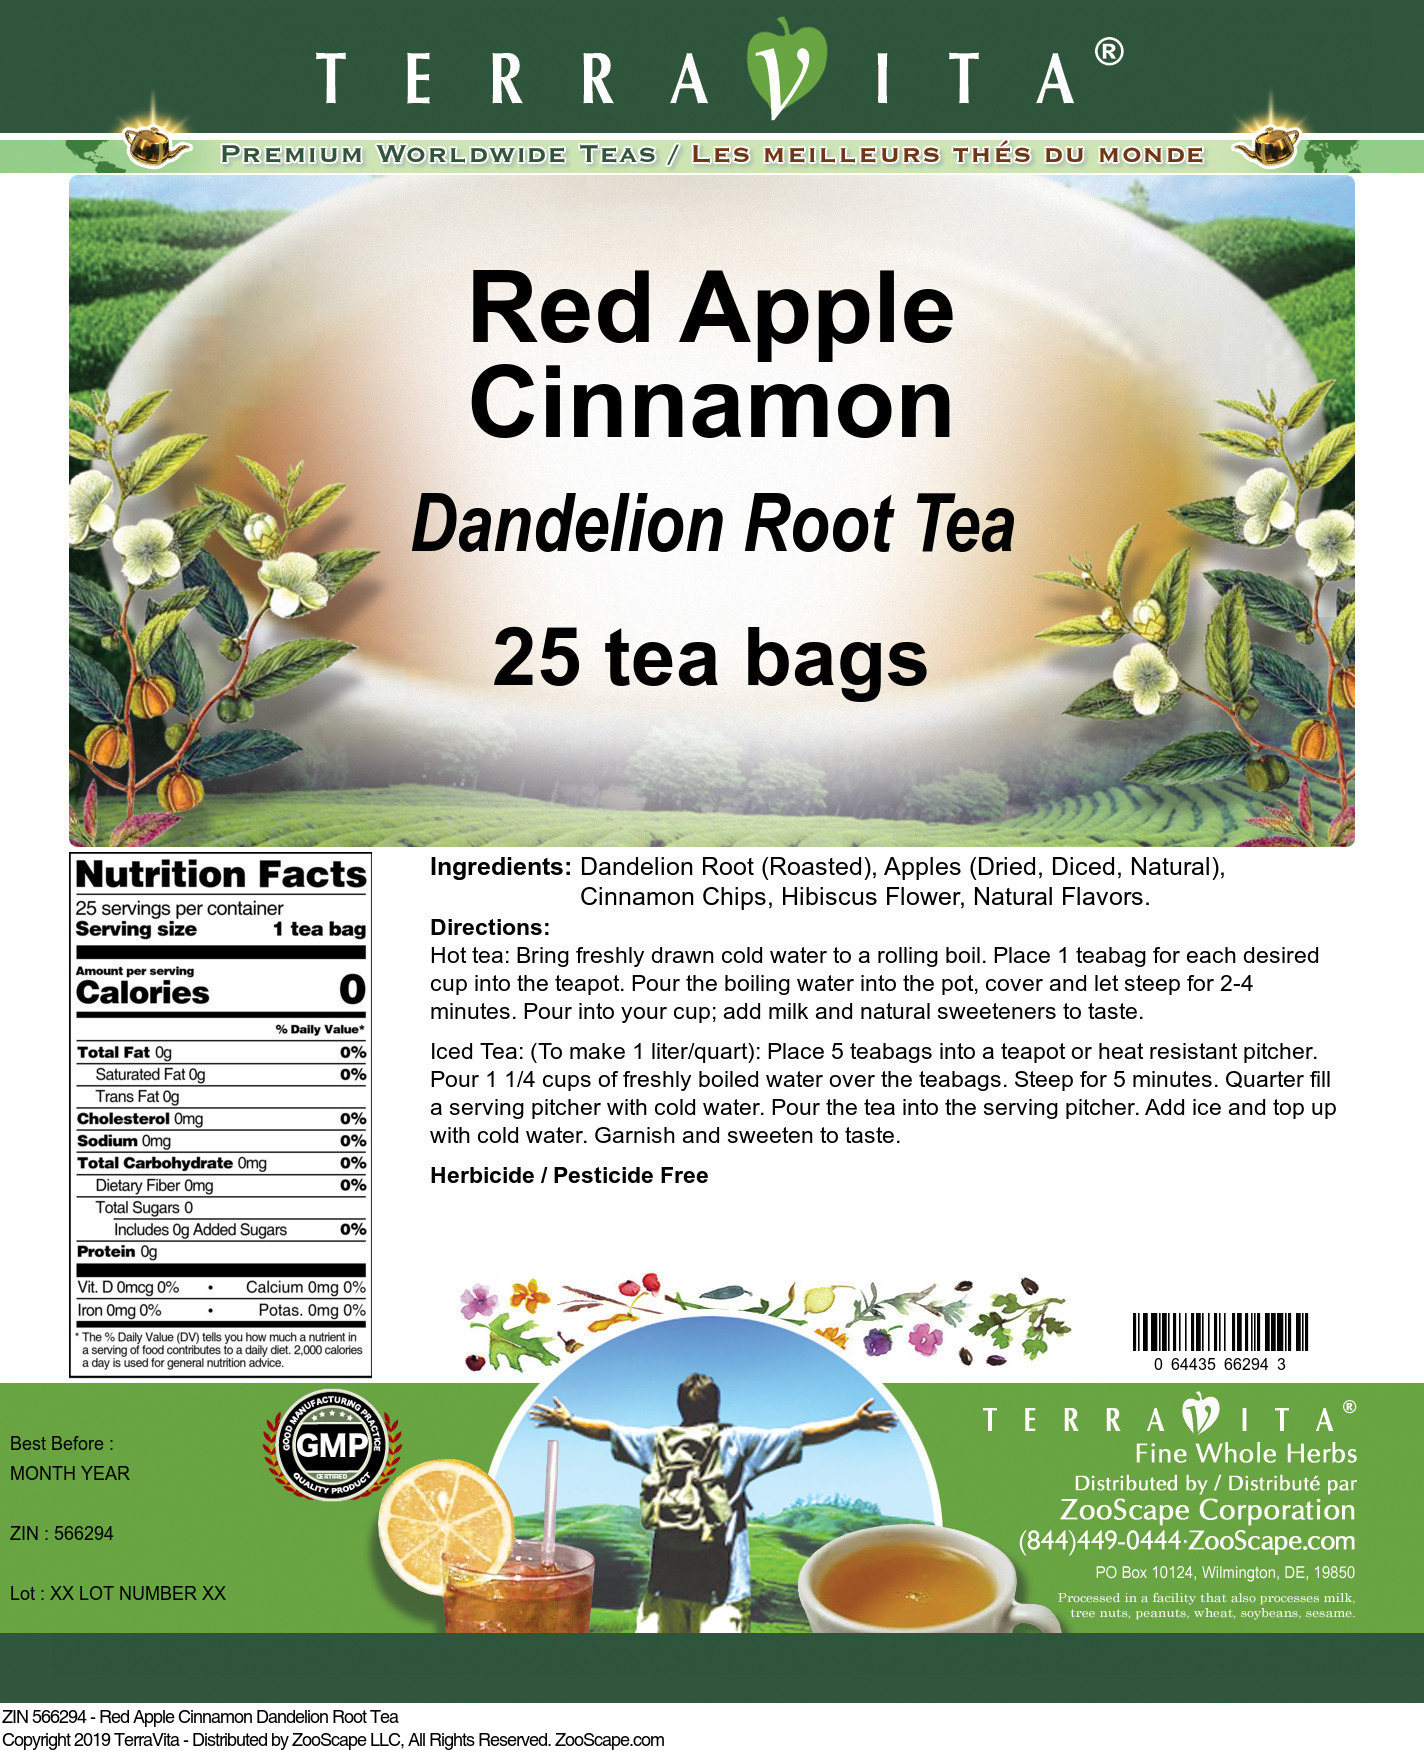 Red Apple Cinnamon Dandelion Root Tea